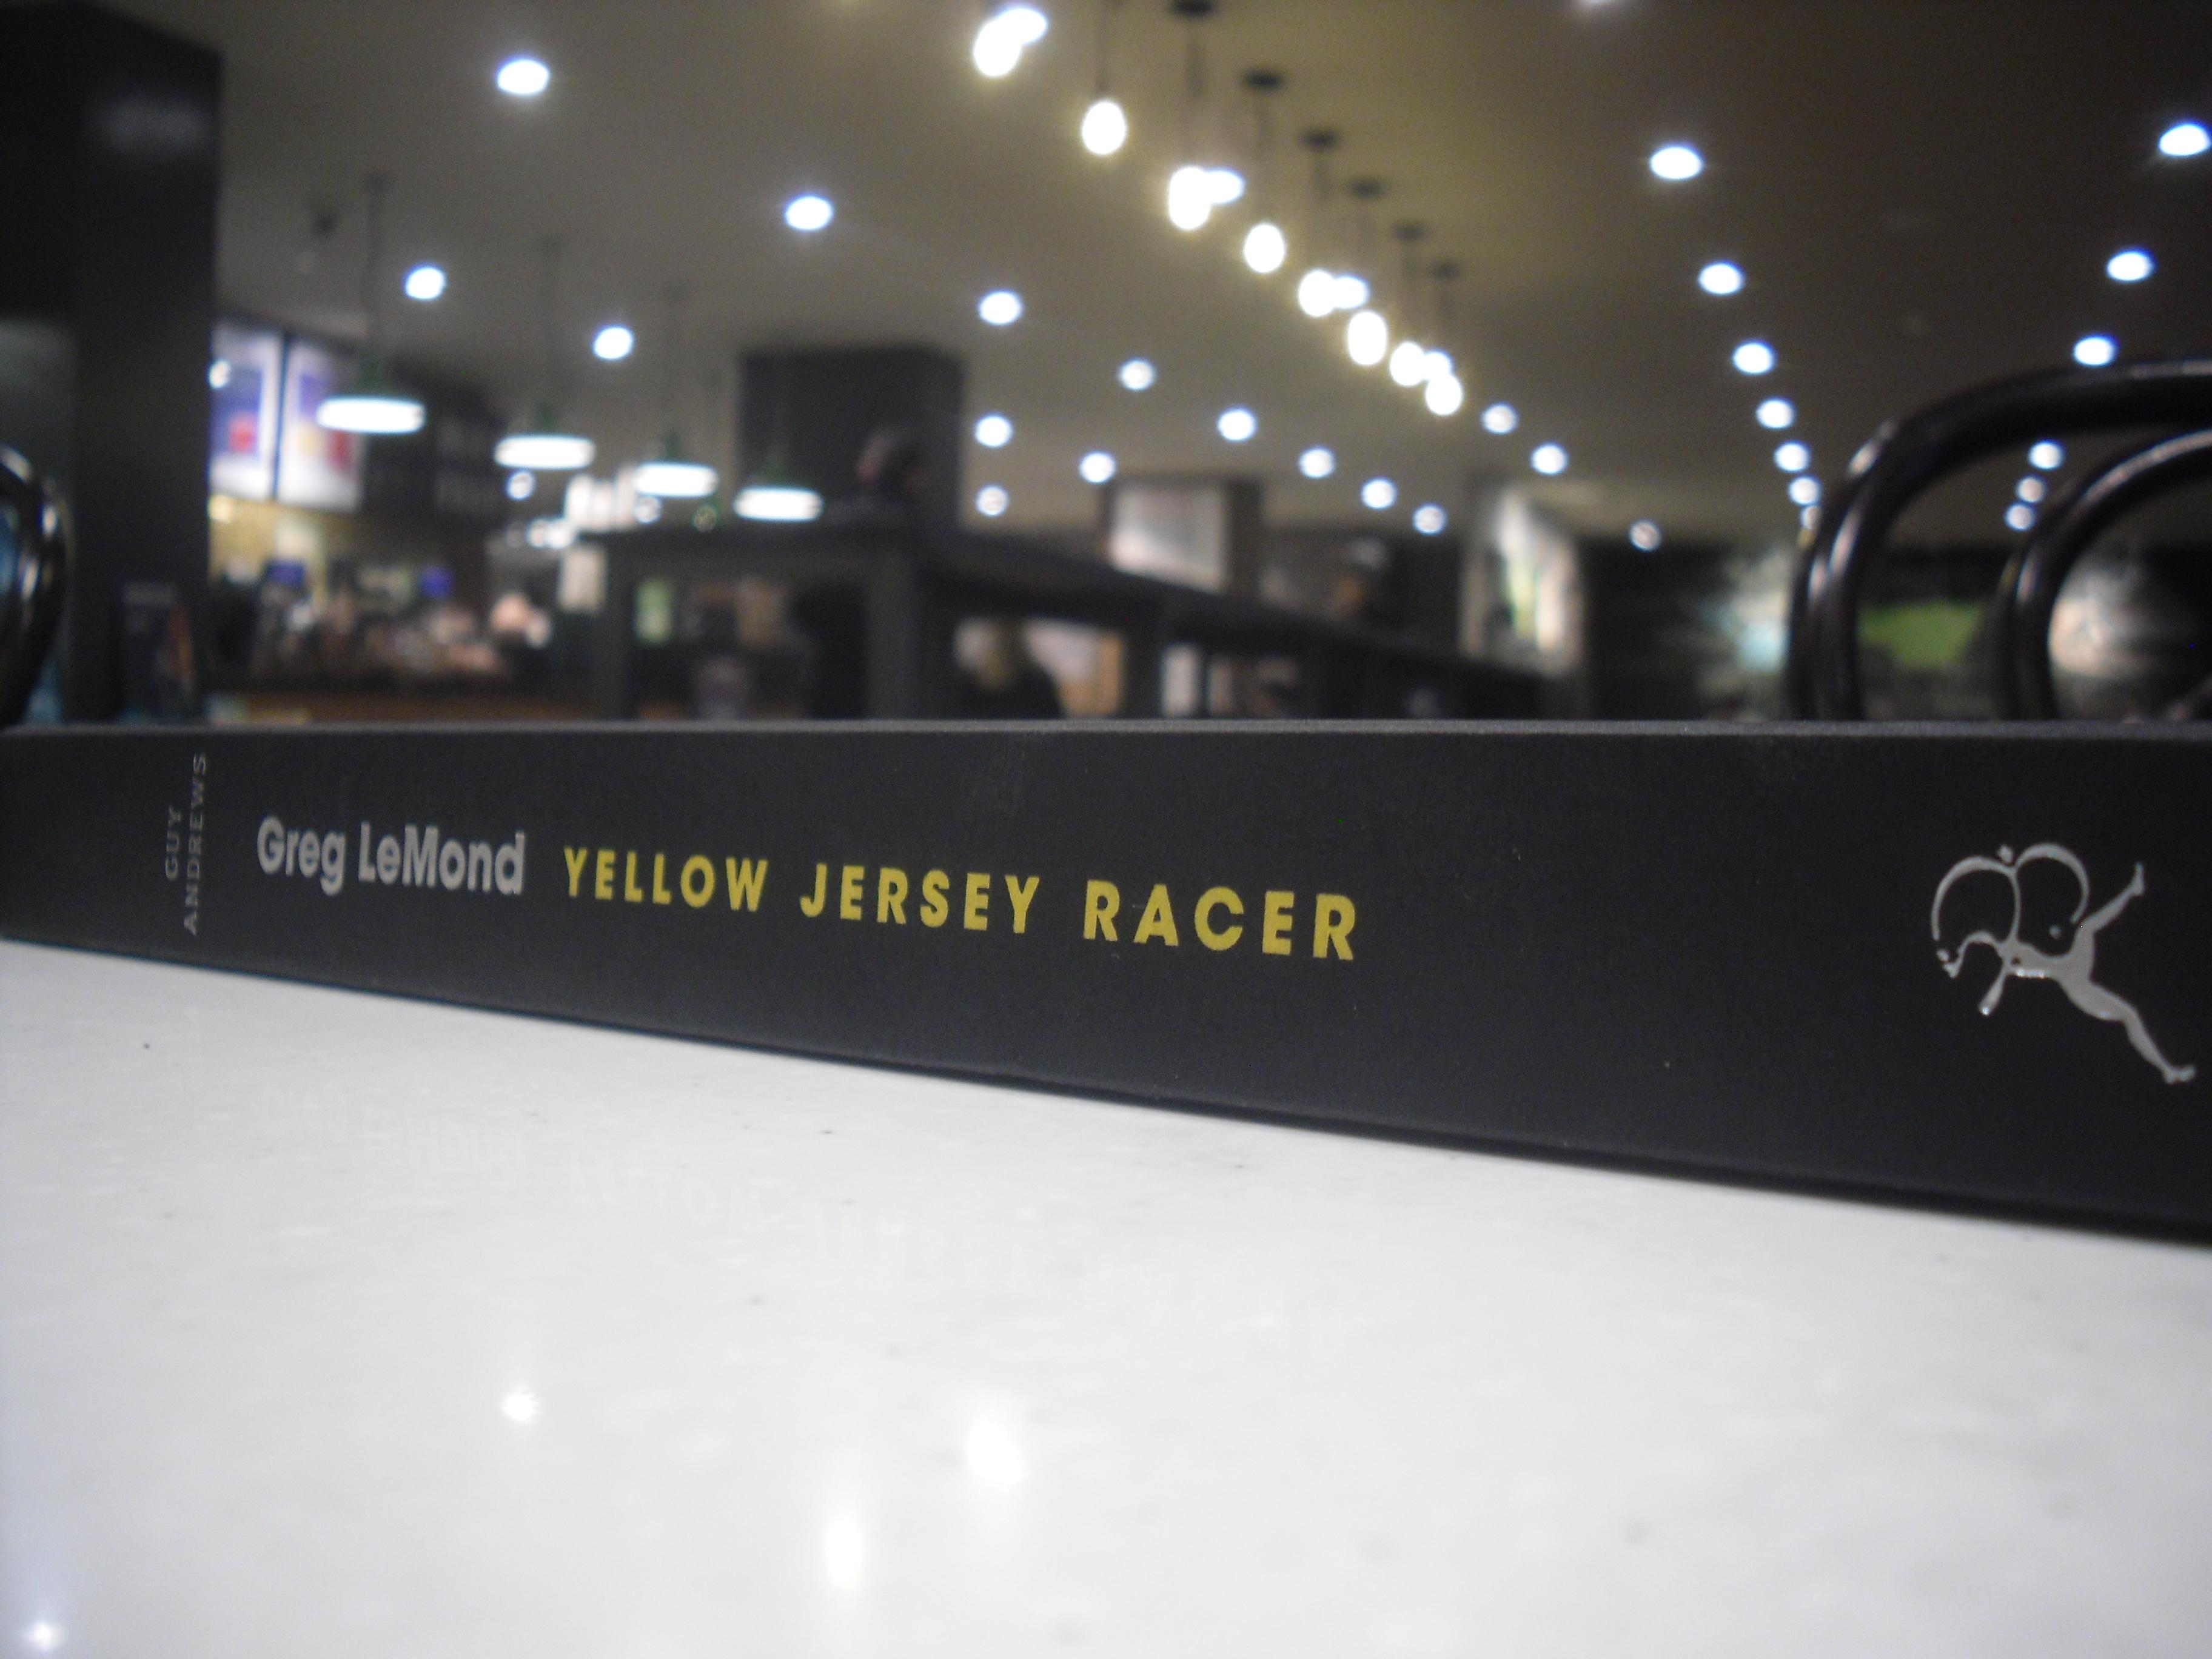 Greg LeMond: Yellow Jersey Racer, by Guy Andrews